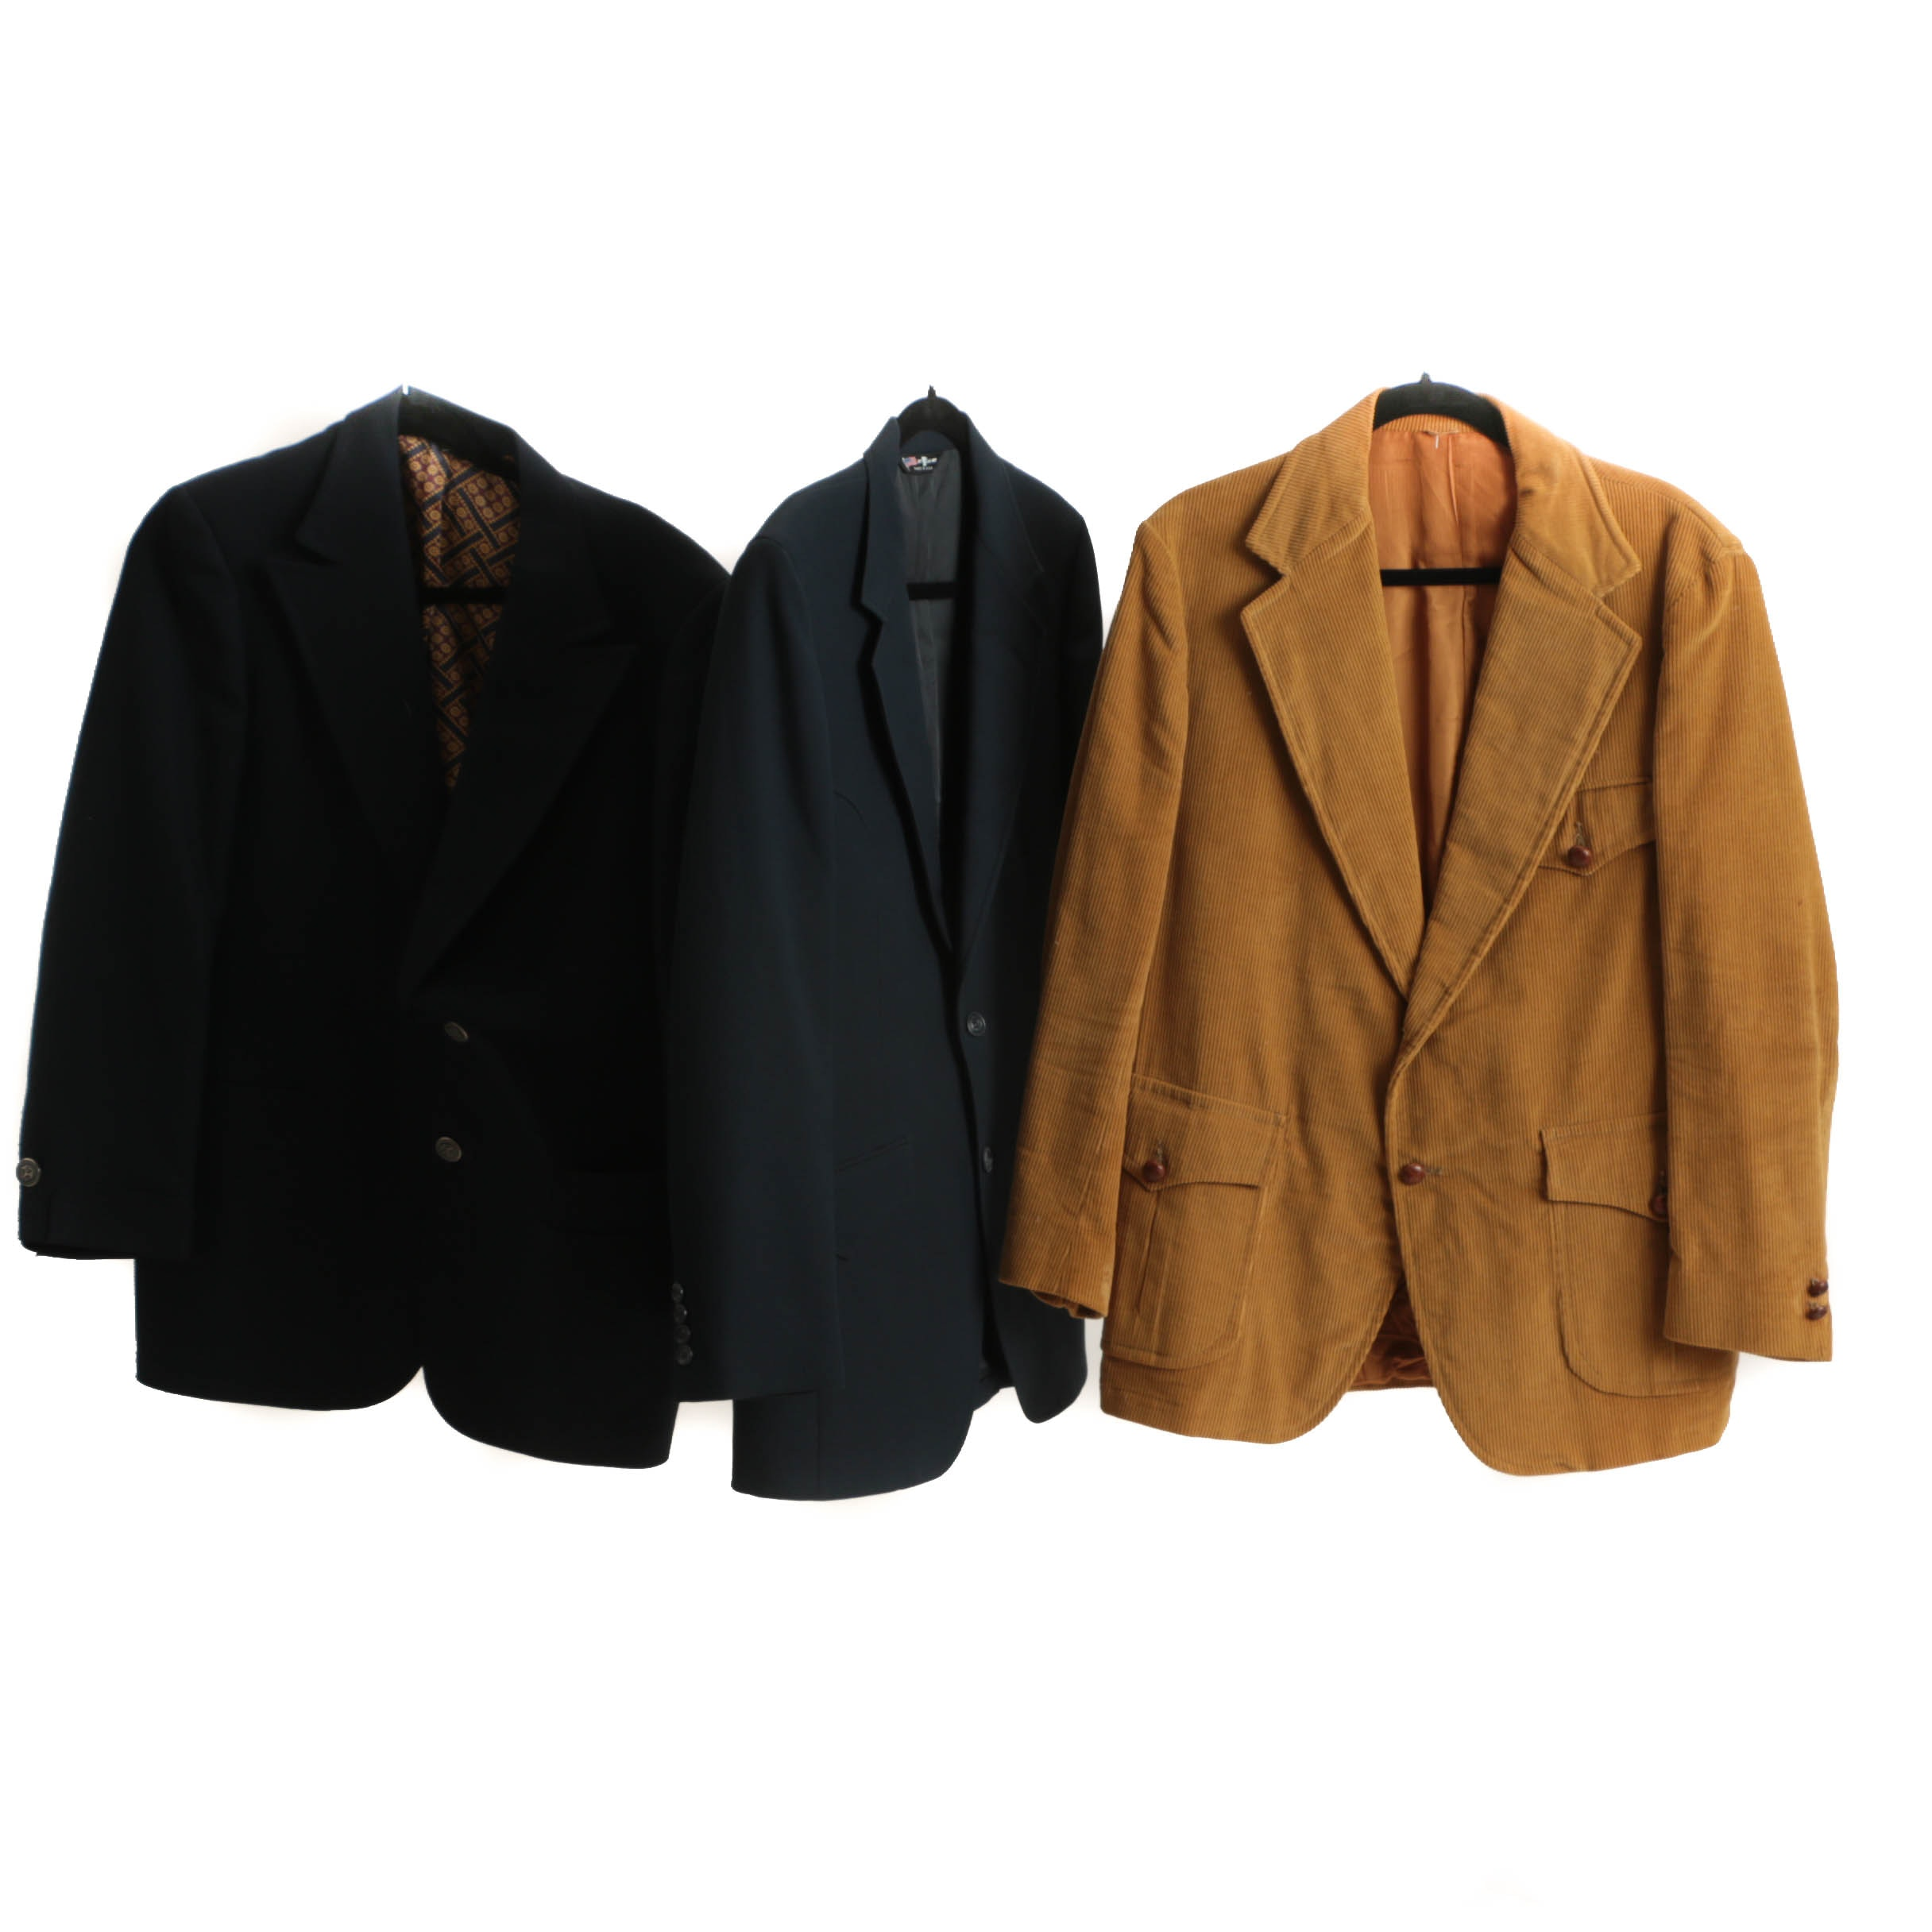 Men's Vintage Blazers